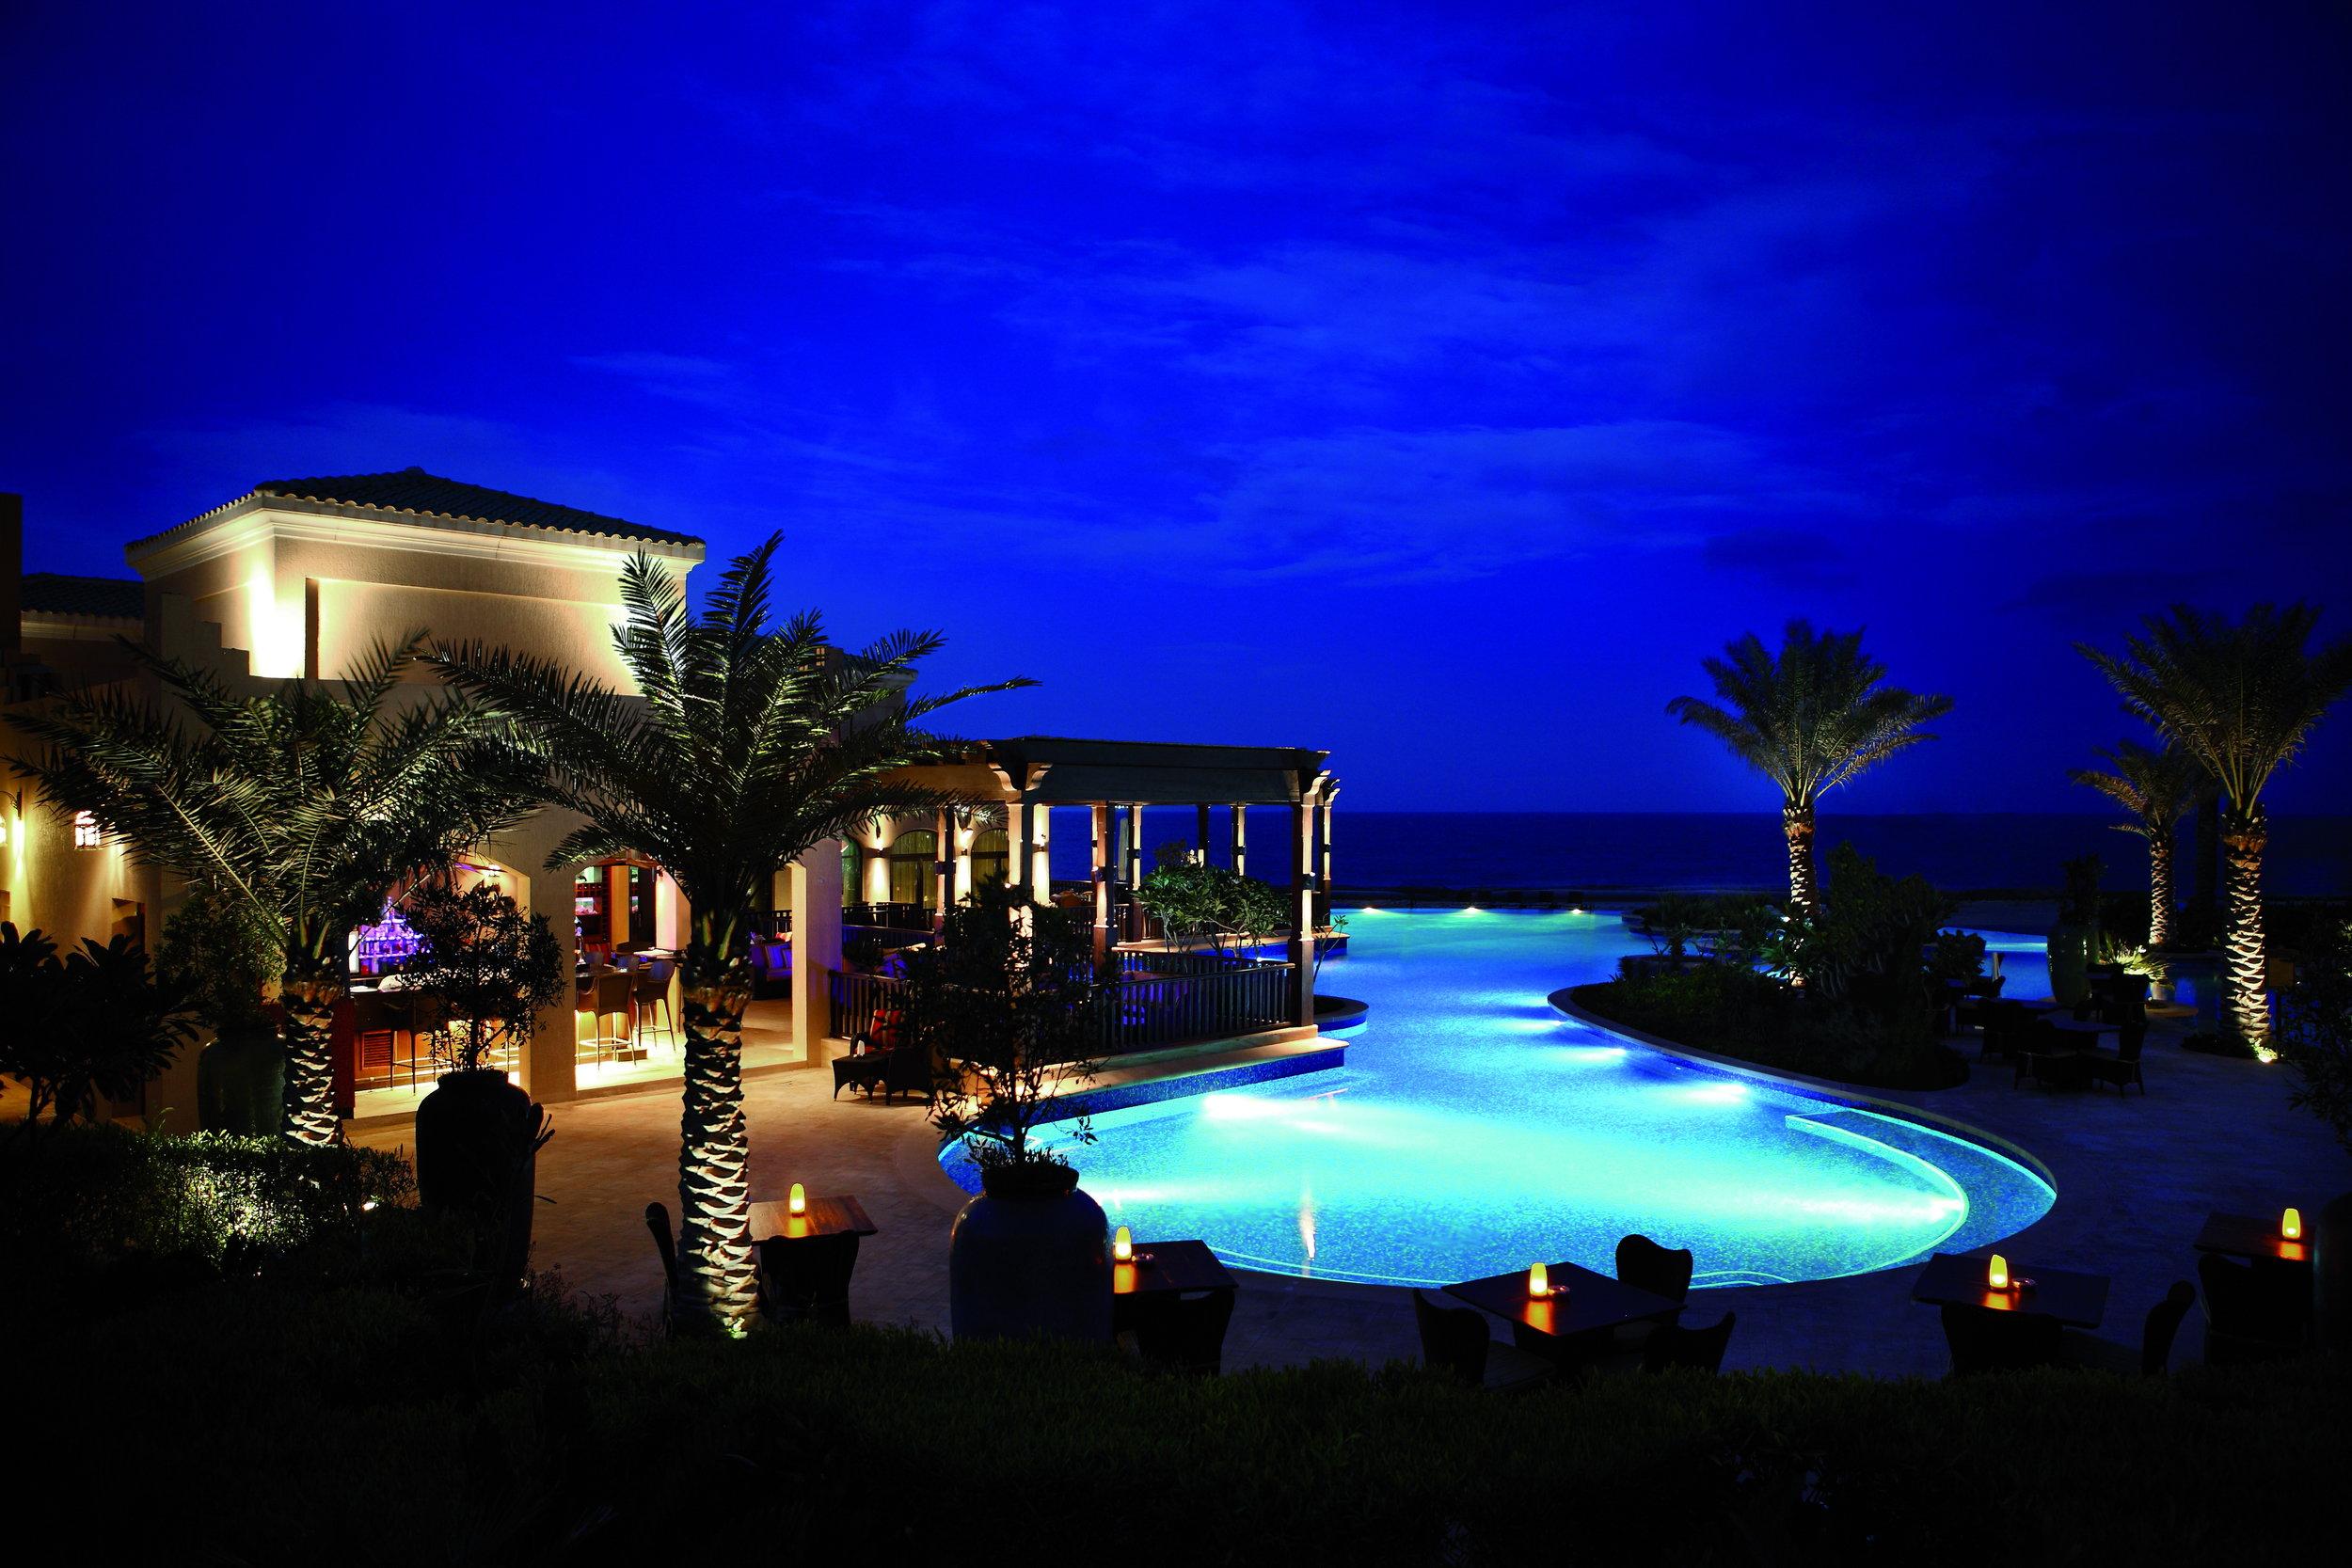 45022647-H1-Swimming_pool_at_night.jpg